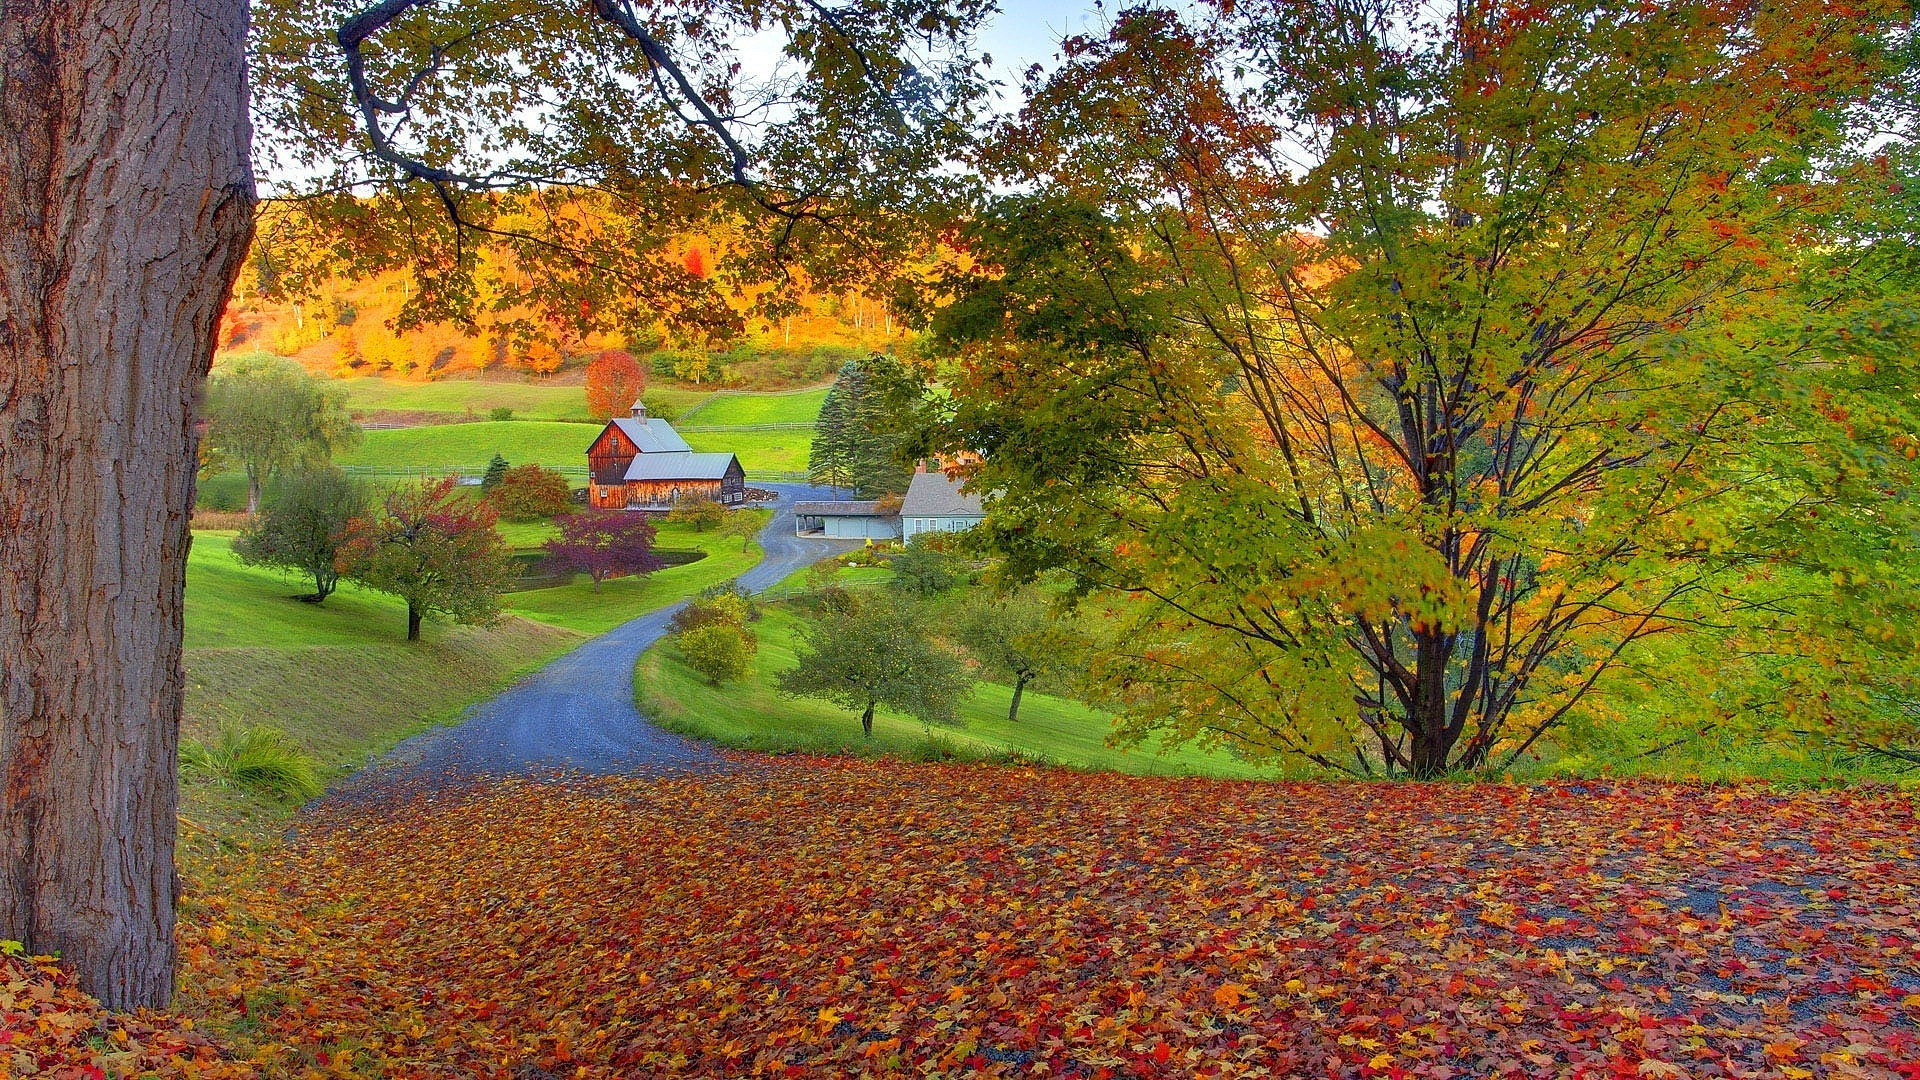 New England Fall Foliage Desktop Wallpaper New England Fall Wallpaper 183 ①